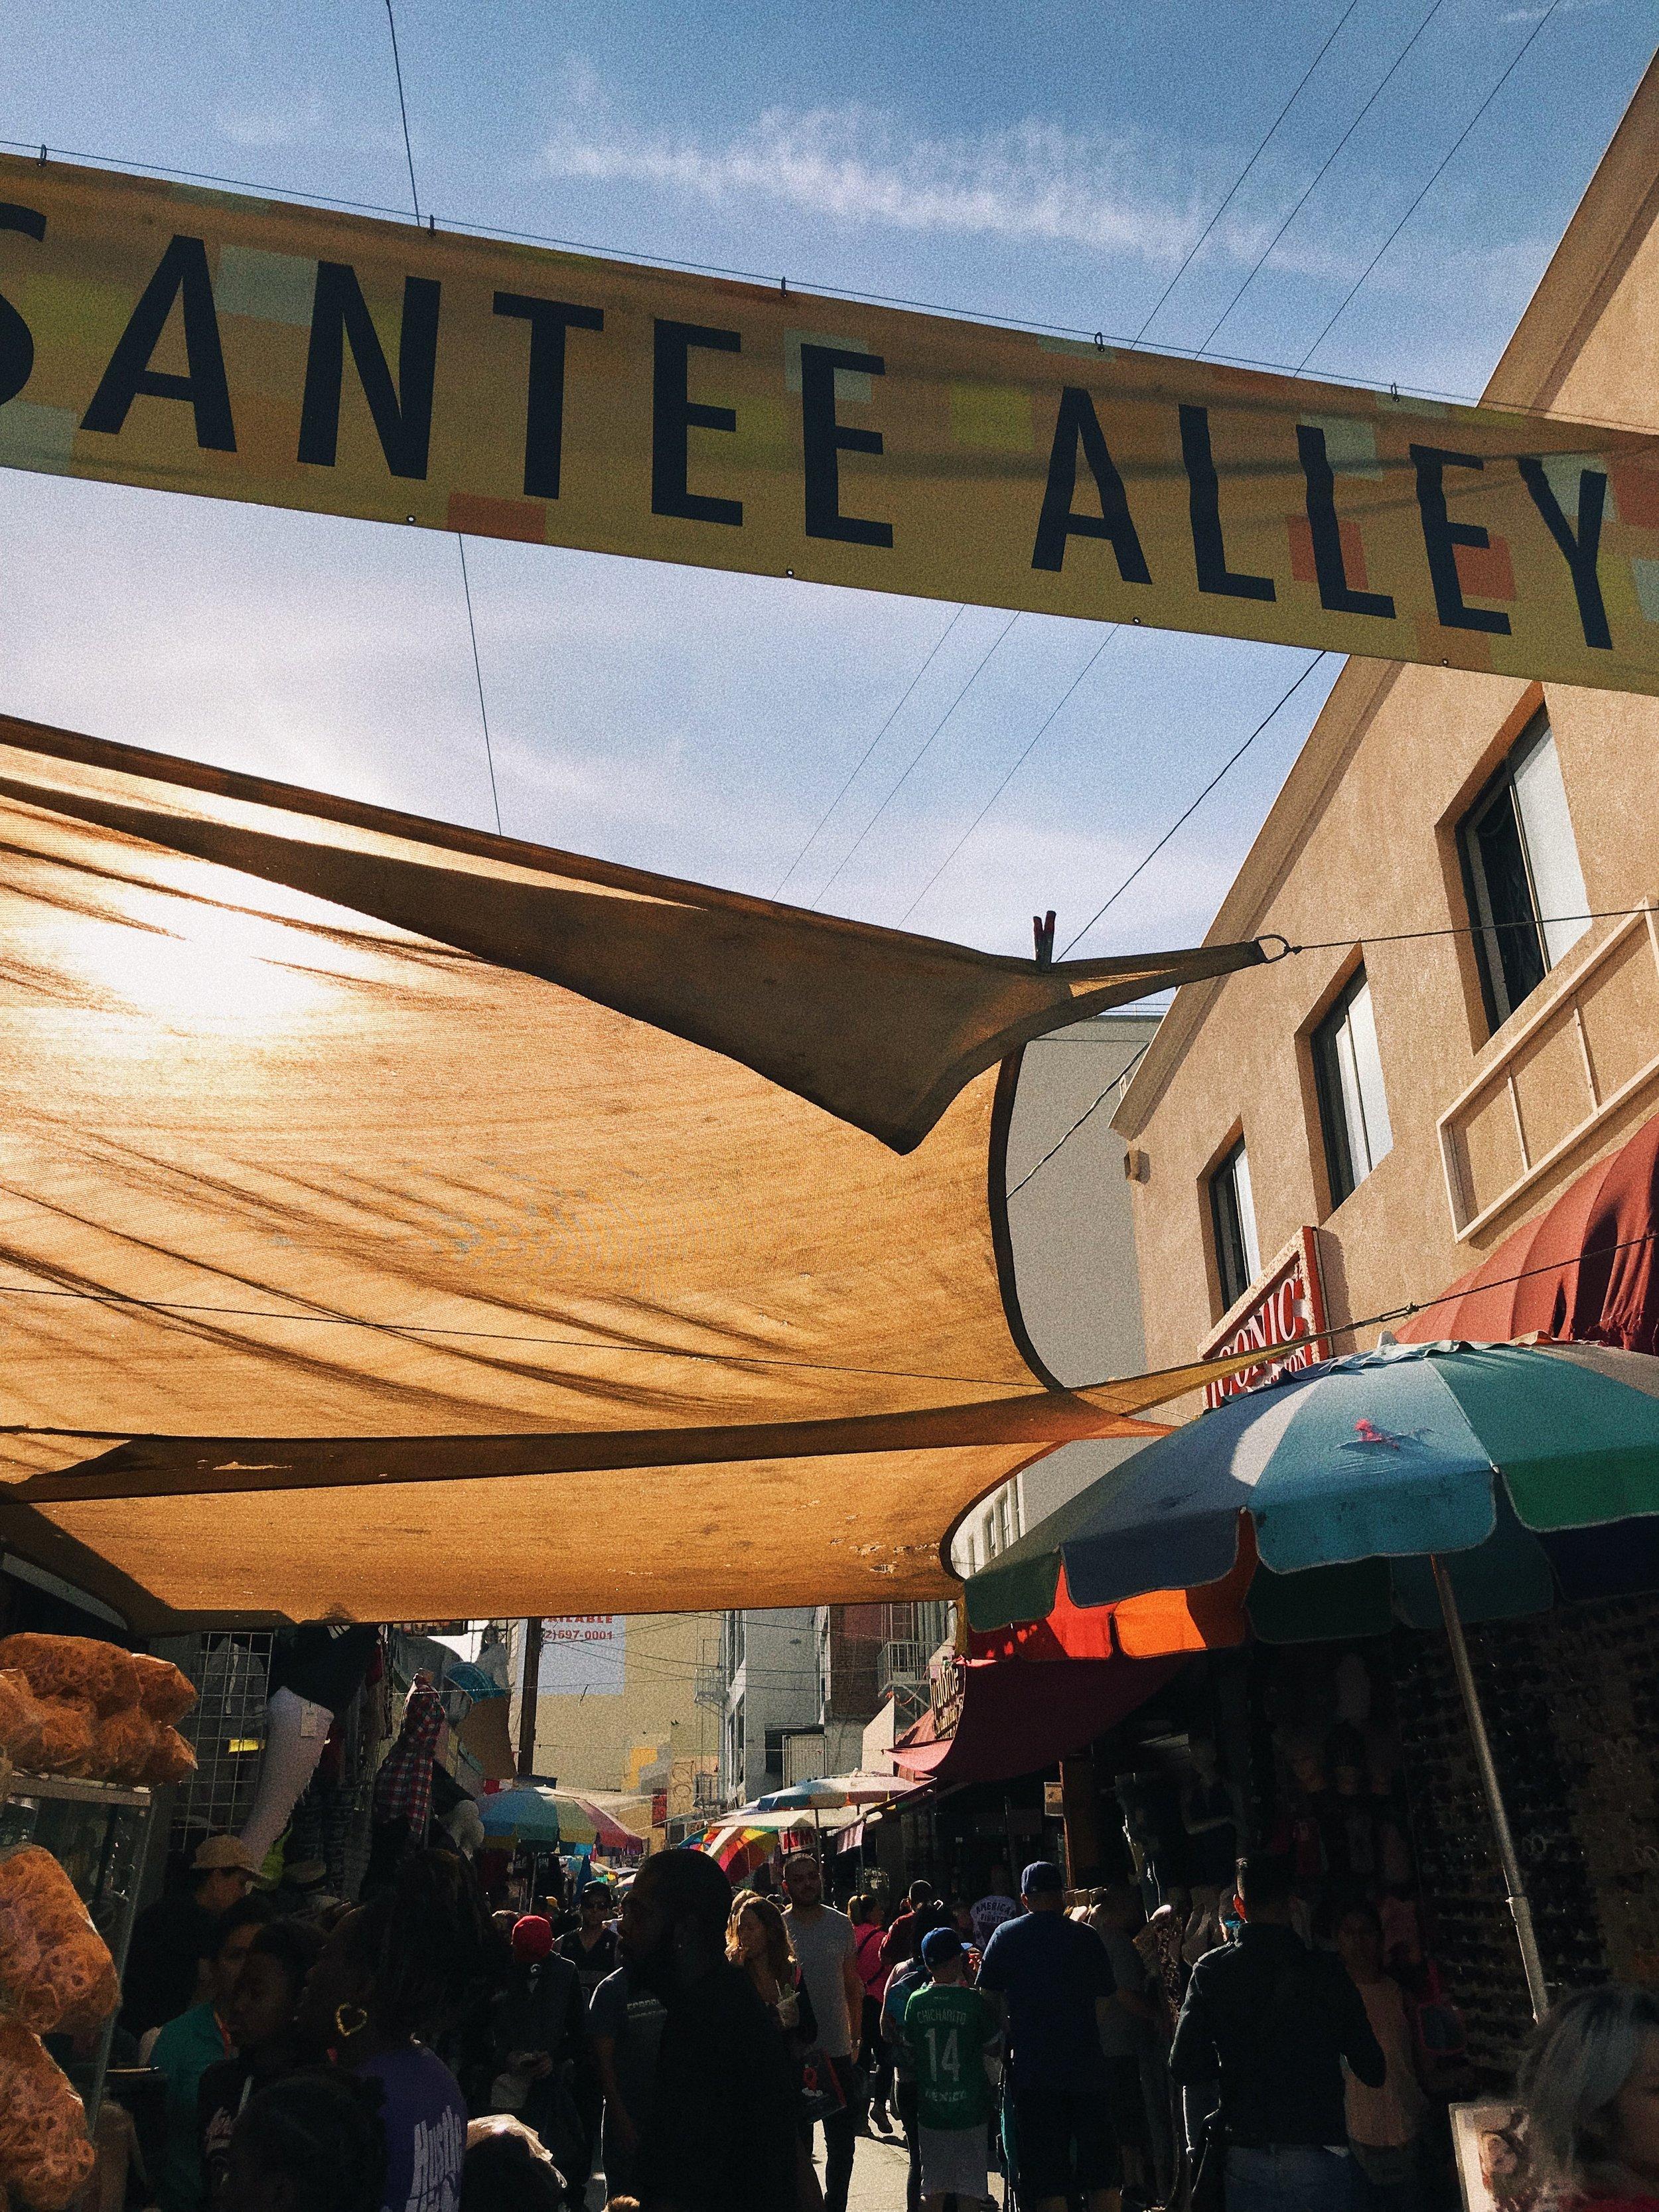 - Santee Alley, Fashion District